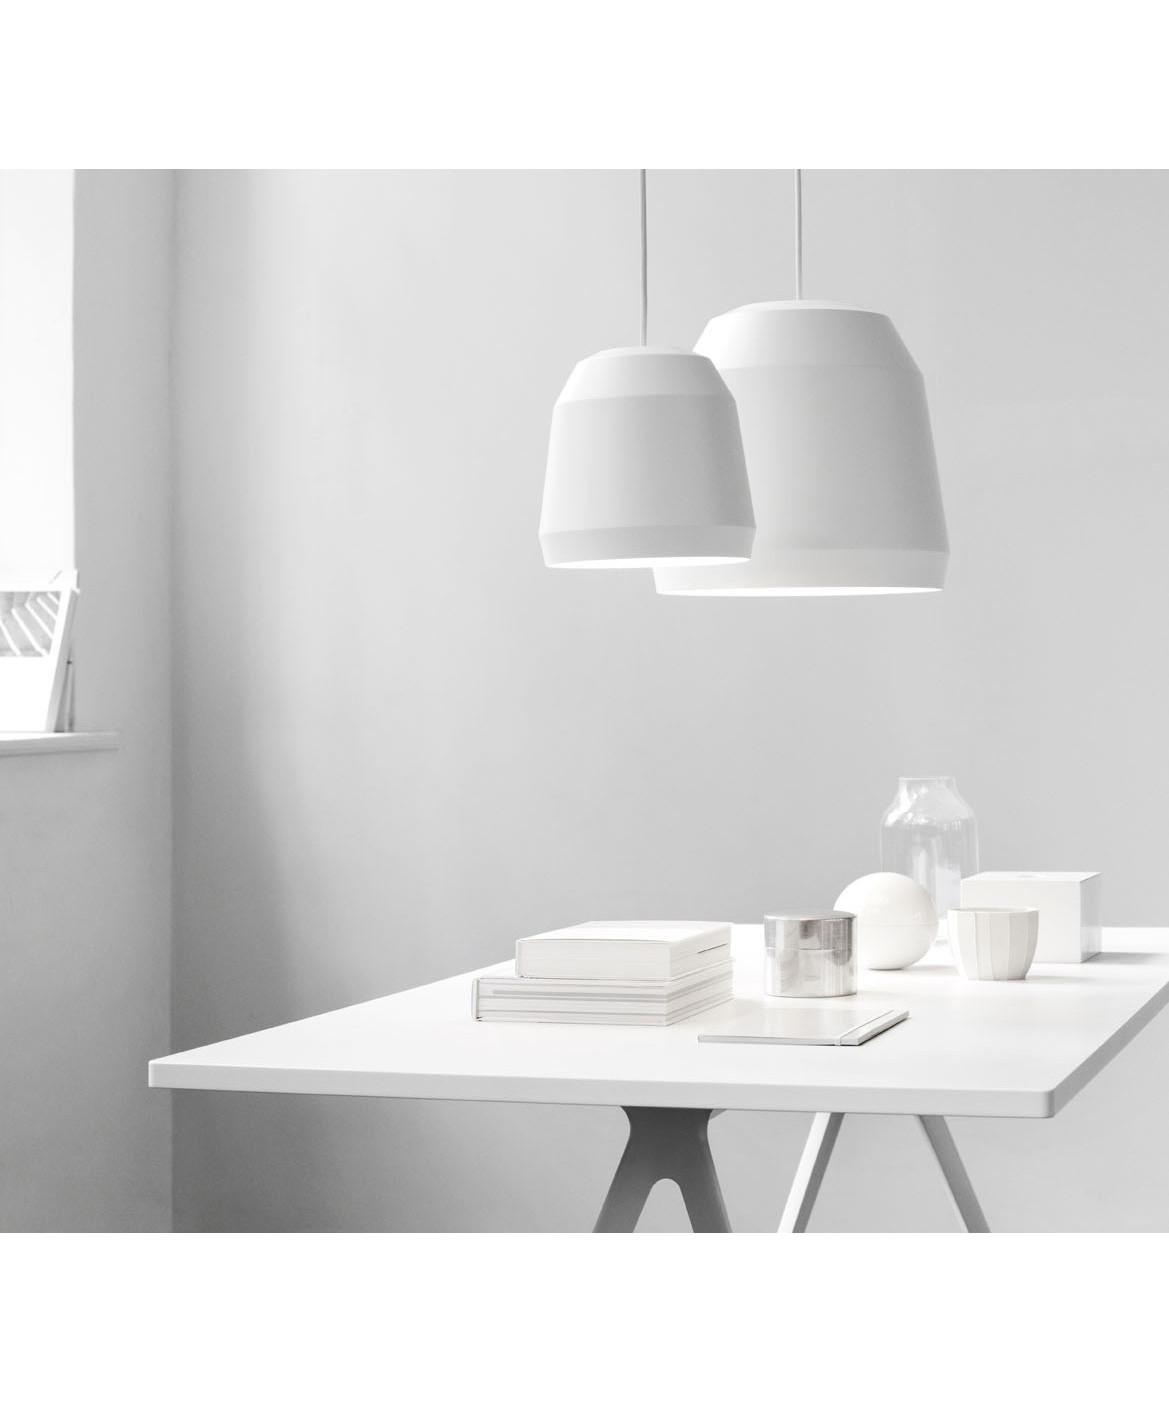 Image of Mingus P1 Pendel White 3m - Lightyears (4460258)